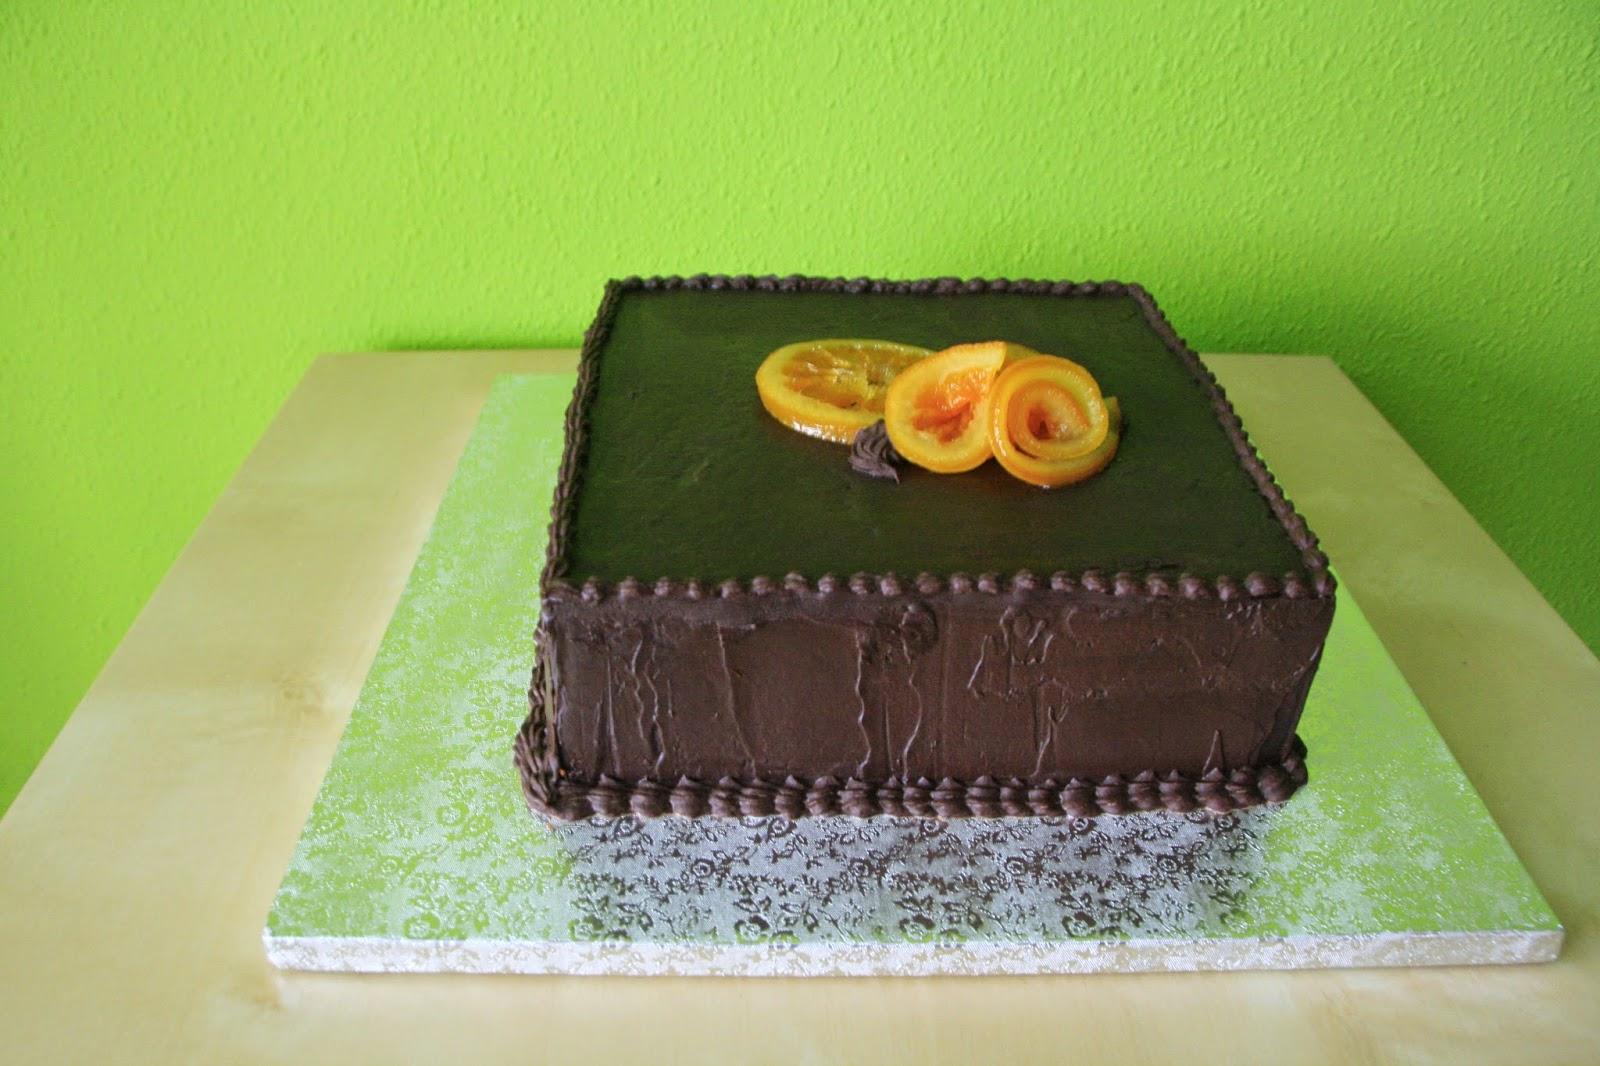 Tarta de xocolata i taronja